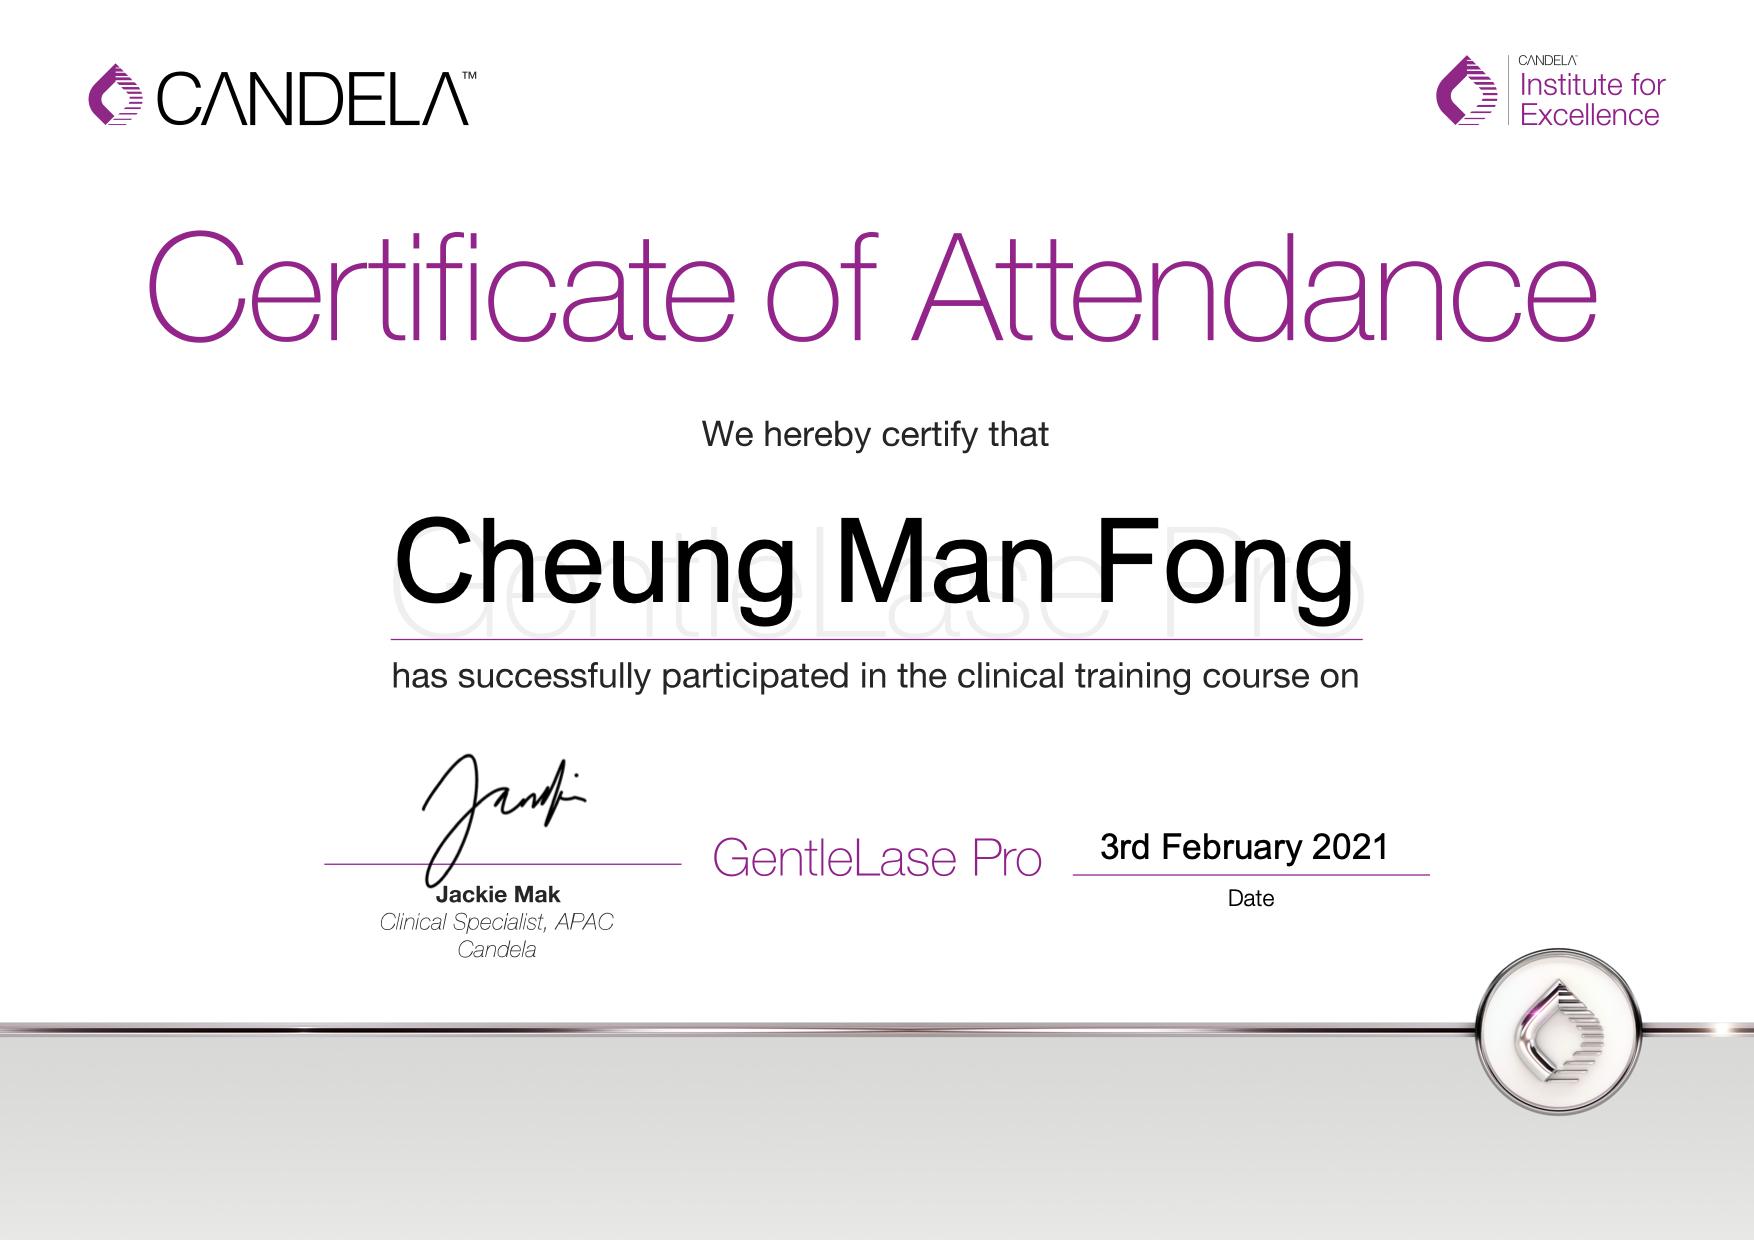 GentleLase_Pro_Certifcate_CheungManFongYanis